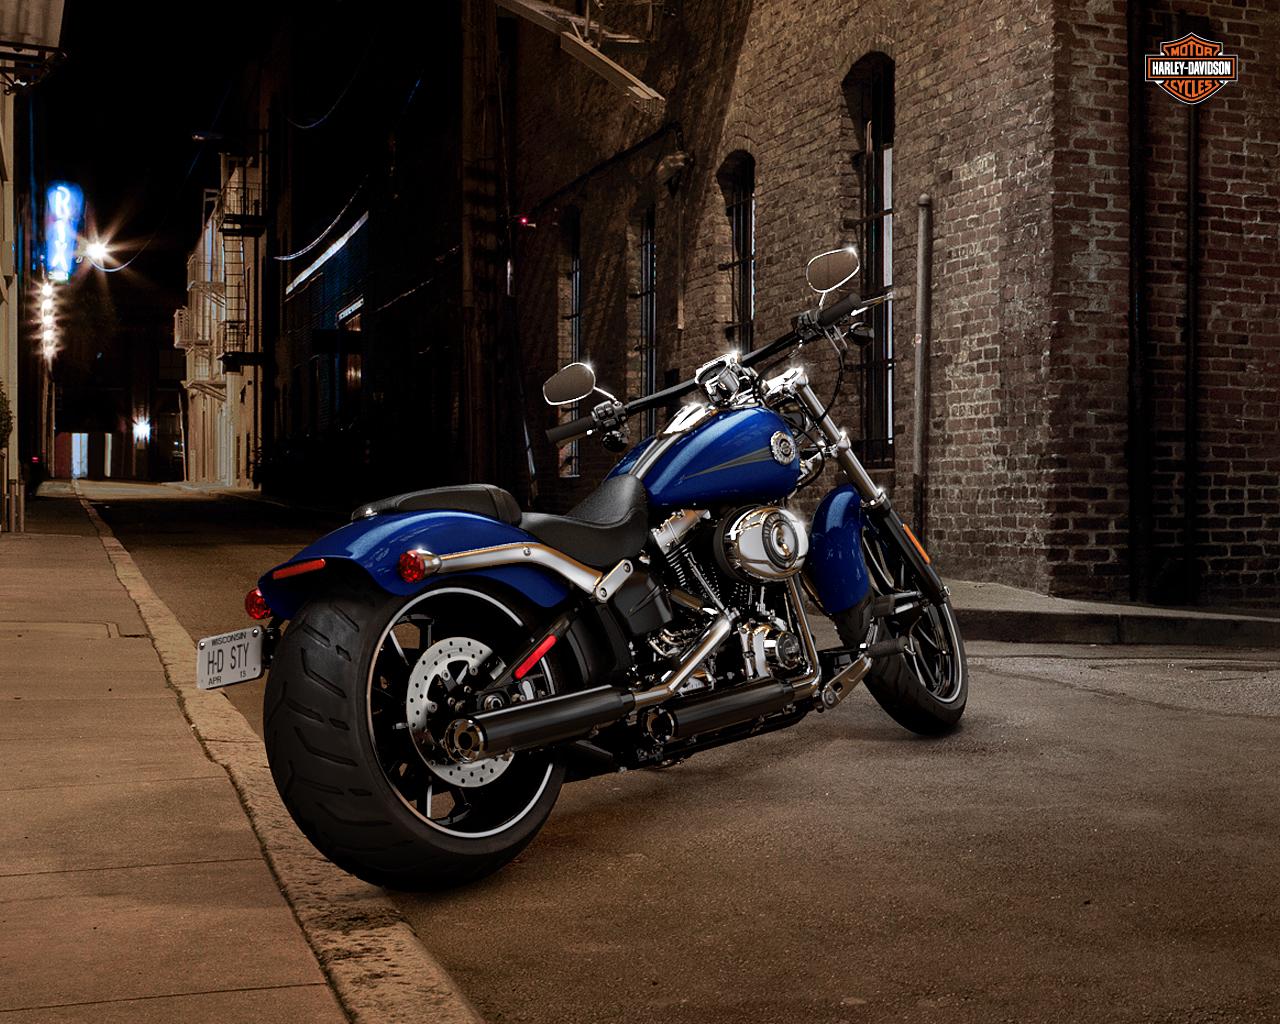 Harley Davidson HD WallpapersHigh Quality   All HD 1280x1024